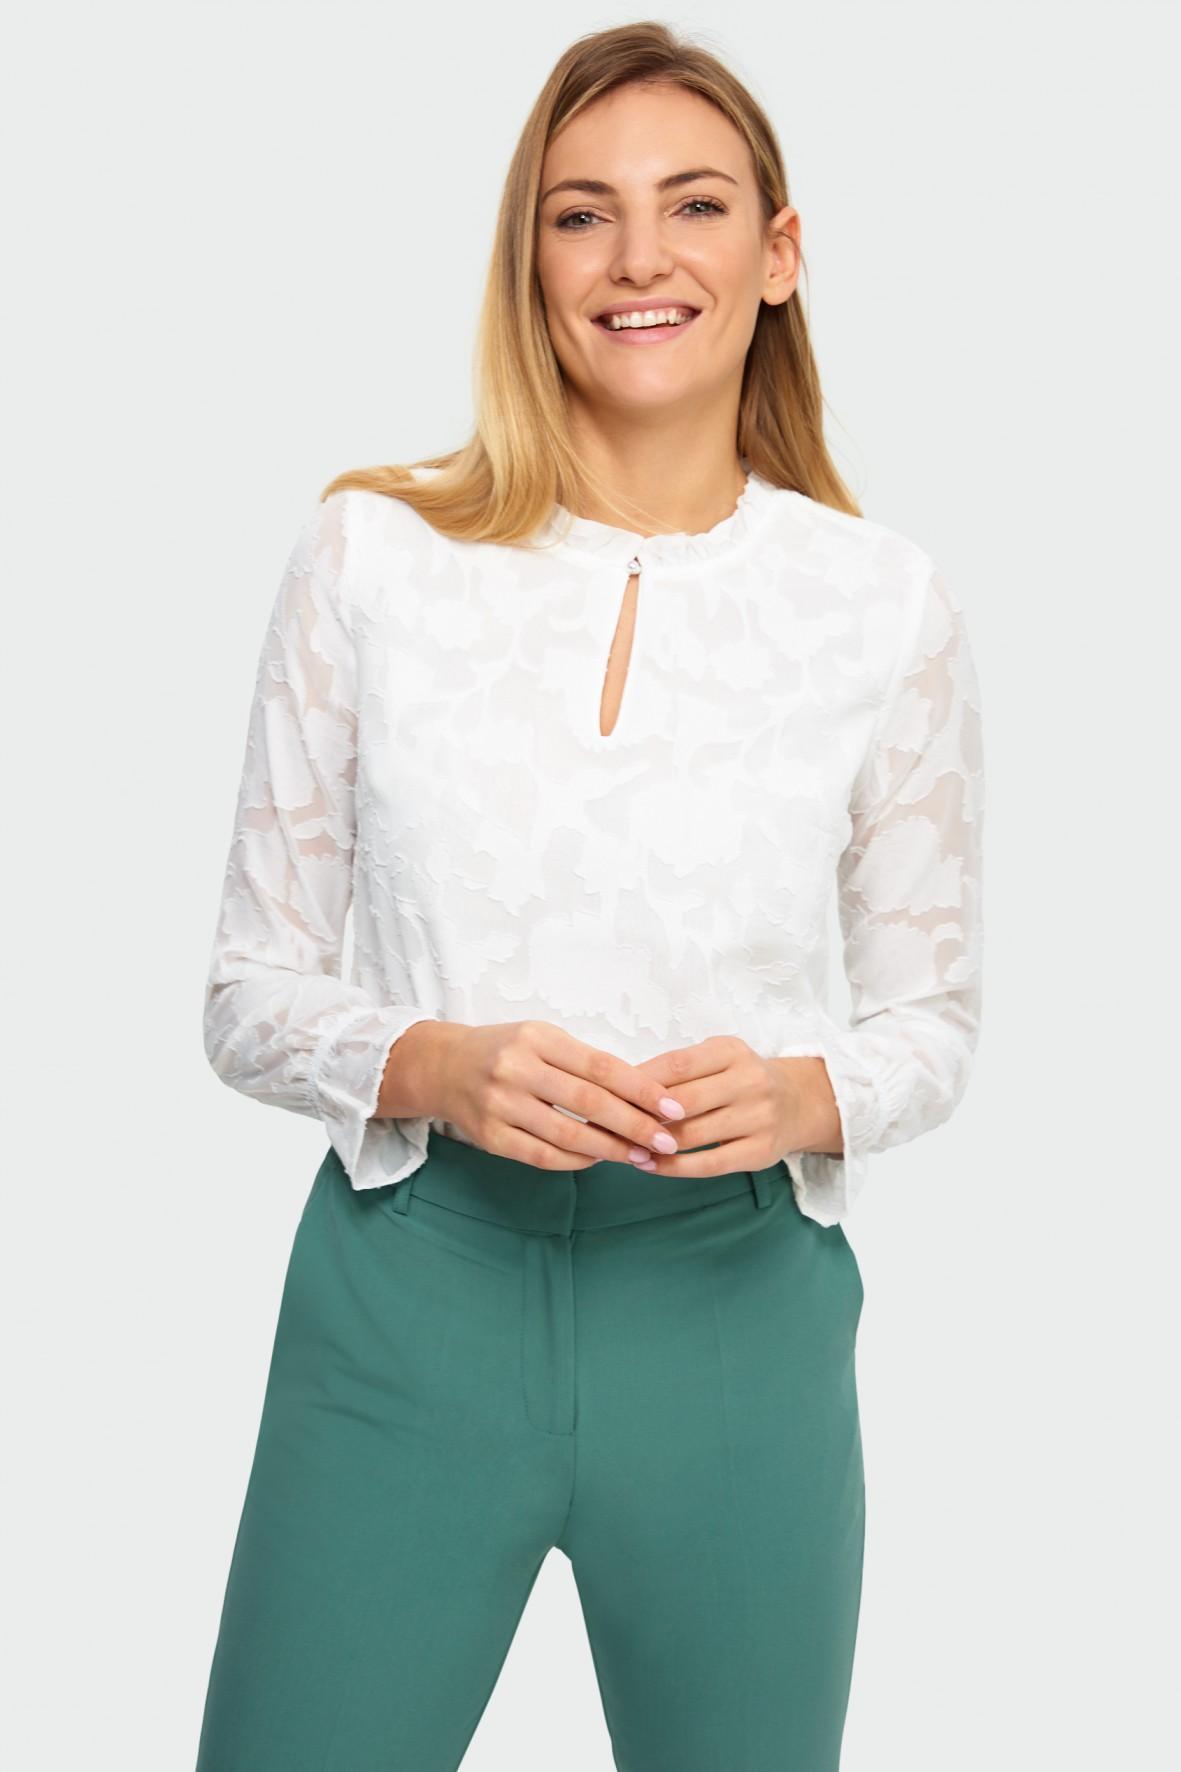 Elegancka bluzka damska biała z długim rękawem